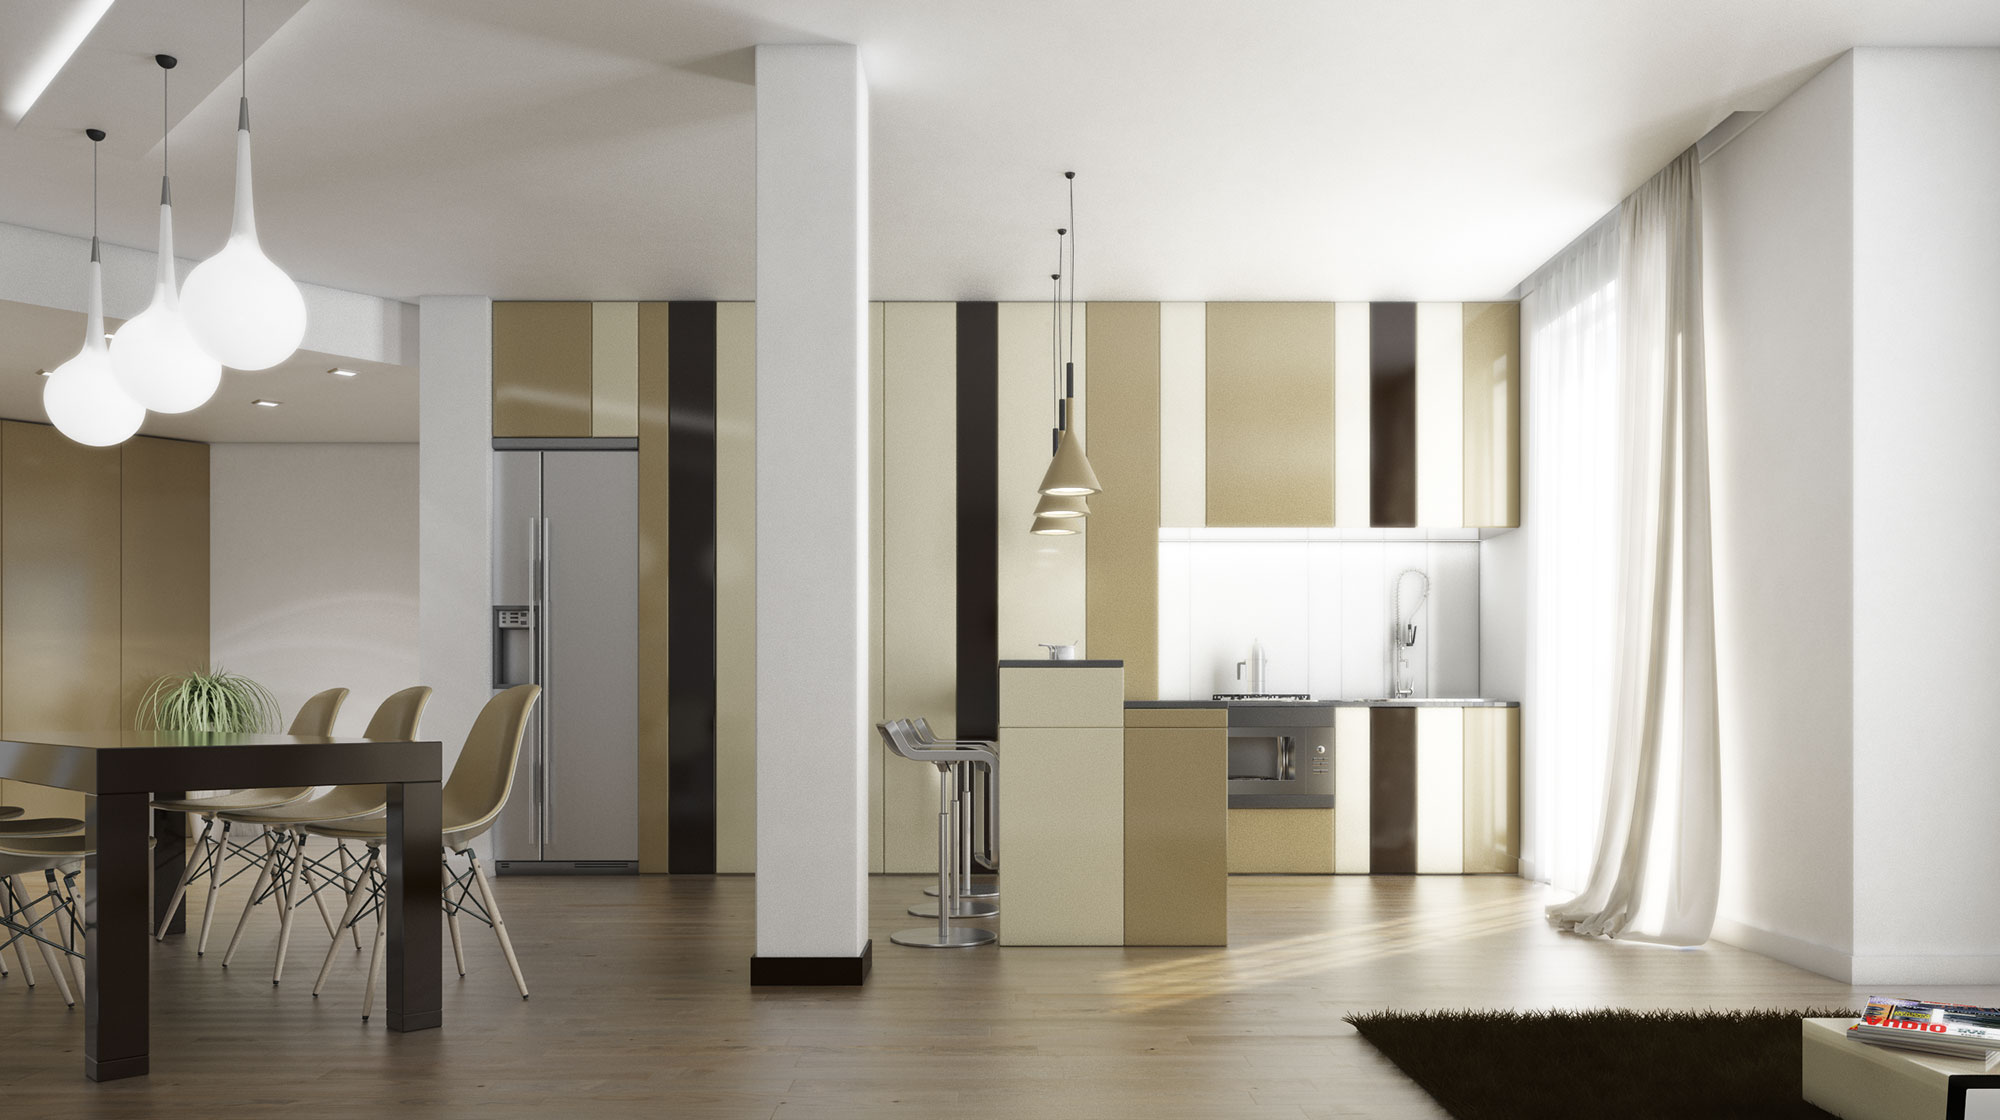 Gli appartamenti di curno ristrutturati a regola d 39 arte for Appartamenti ristrutturati